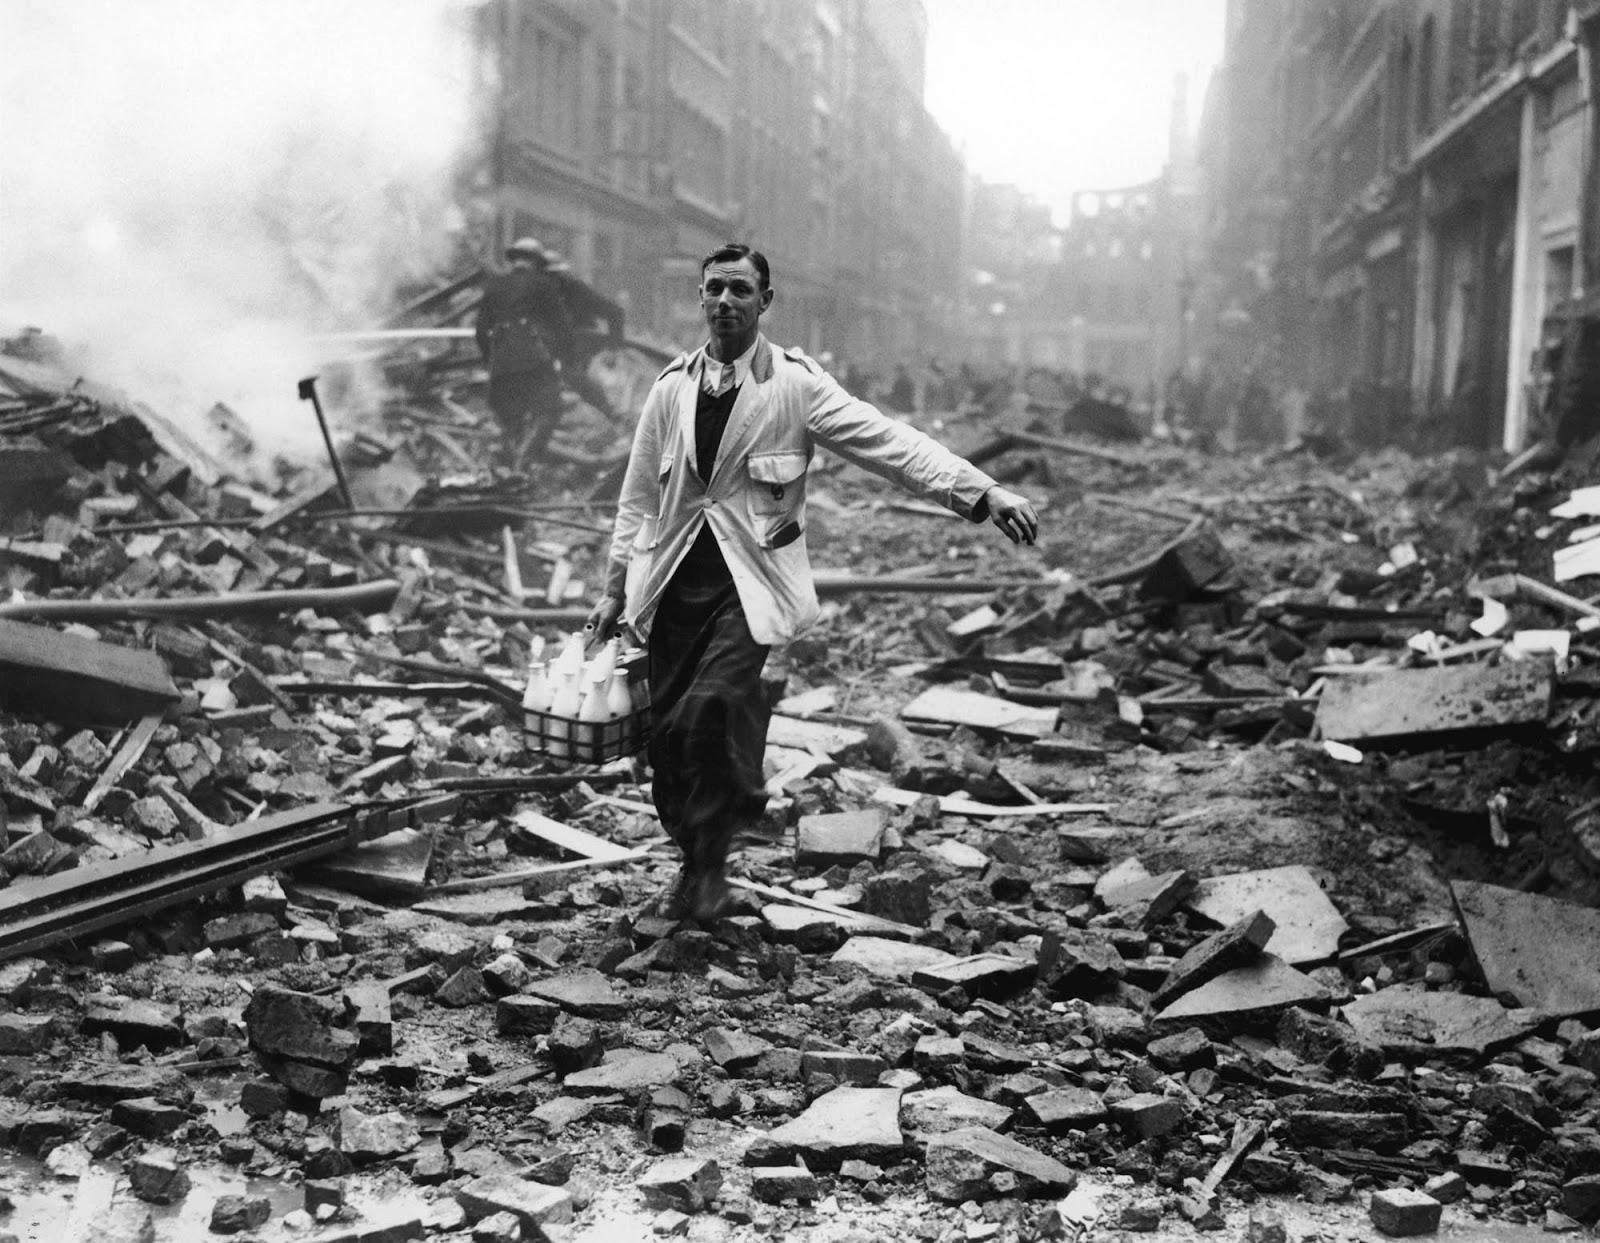 The Milkman - 1940. Rare Historical Photos